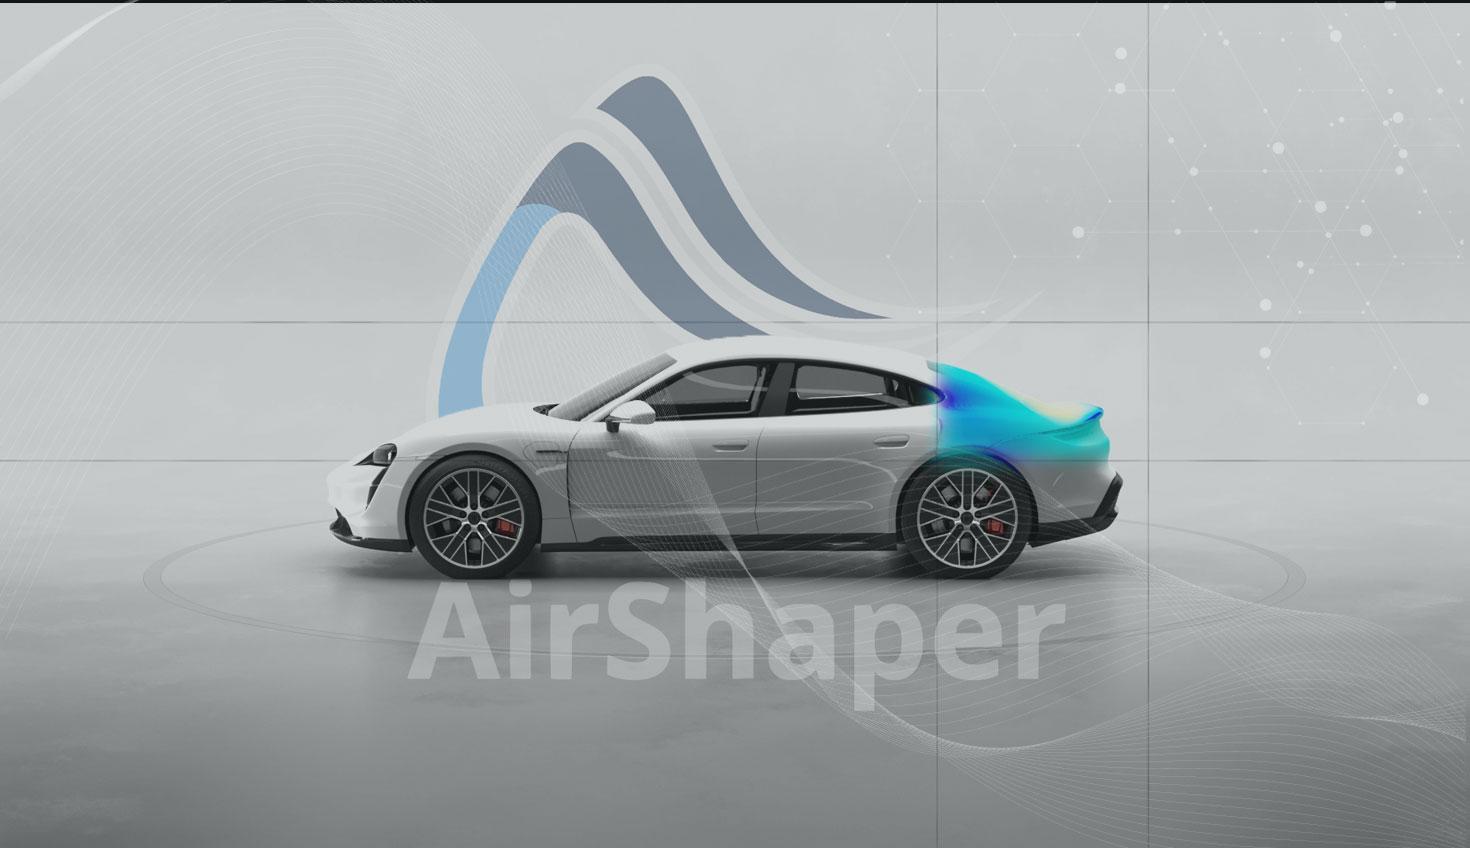 Onshape Partner Spotlight: AirShaper Changes Aerodynamic Optimization